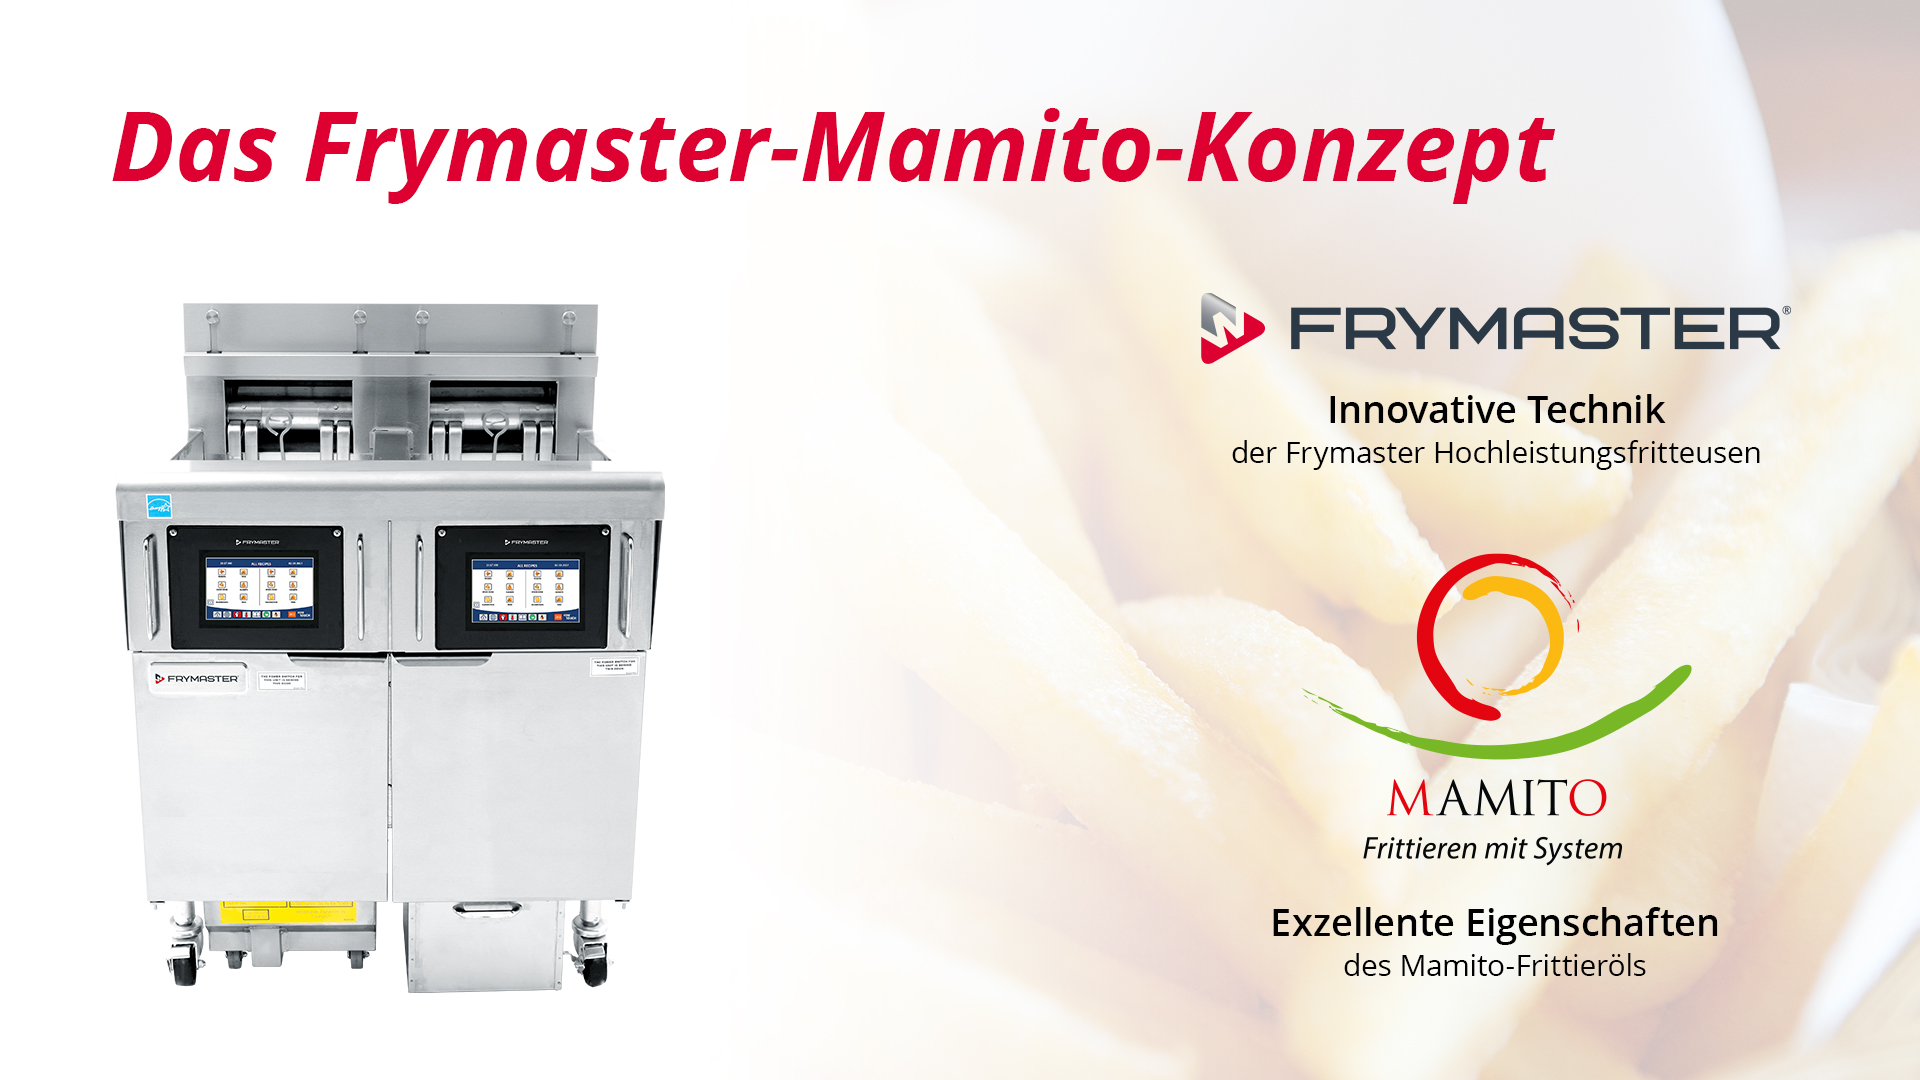 Frymaster_Landingpage_kurz_1080p_V02